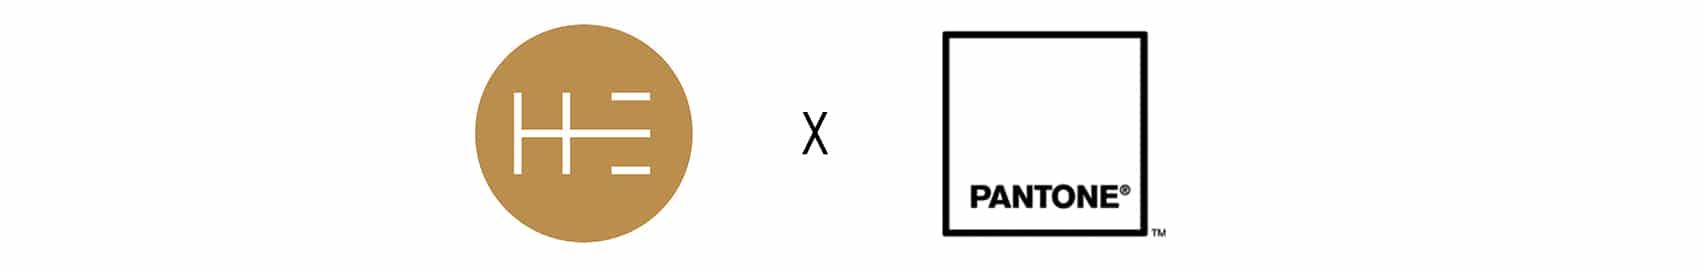 Logos Pantone x Heuritech